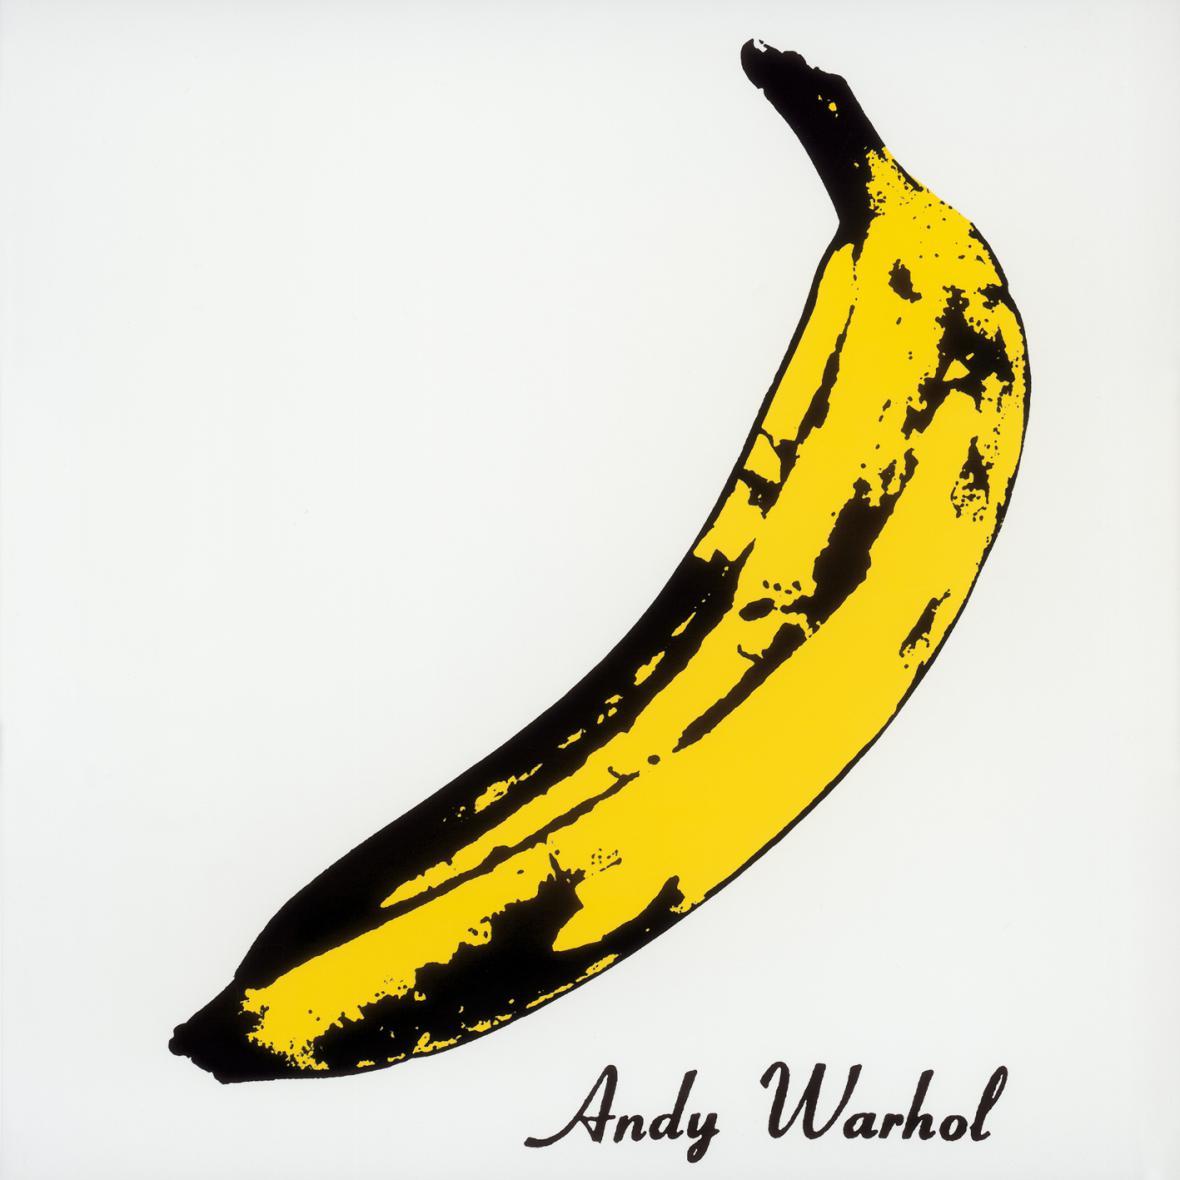 Andy Warhol & The Velvet Underground, 1966-67